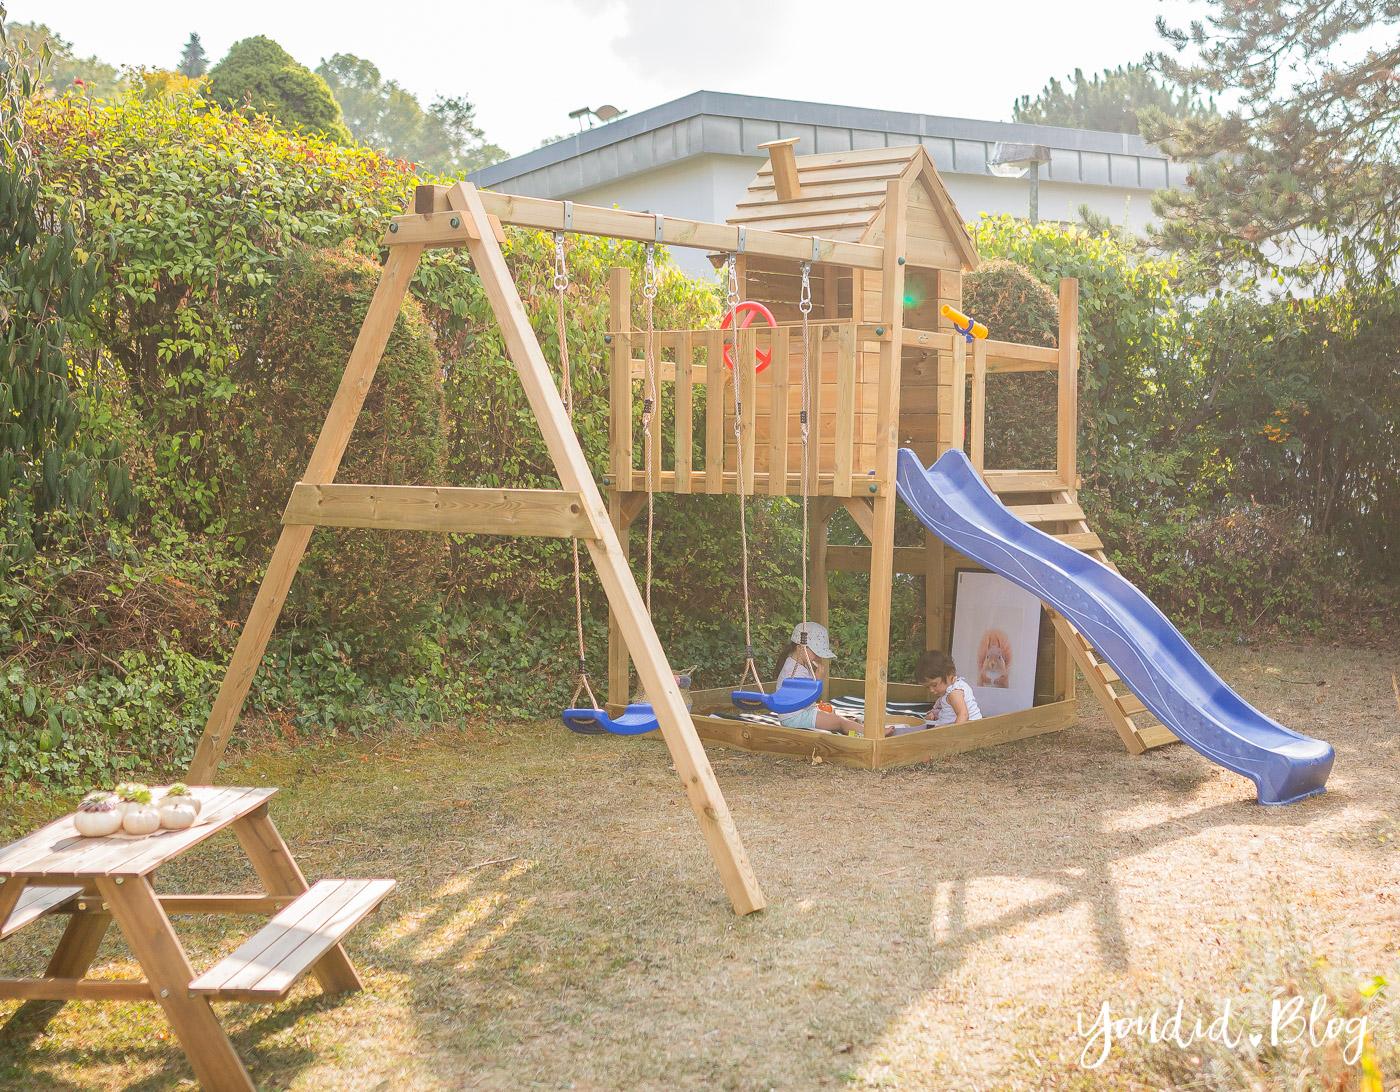 Full Size of Kinderzimmer Mit Schaukel Caseconradcom Kinderspielturm Garten Spielturm Inselküche Abverkauf Bad Wohnzimmer Spielturm Abverkauf